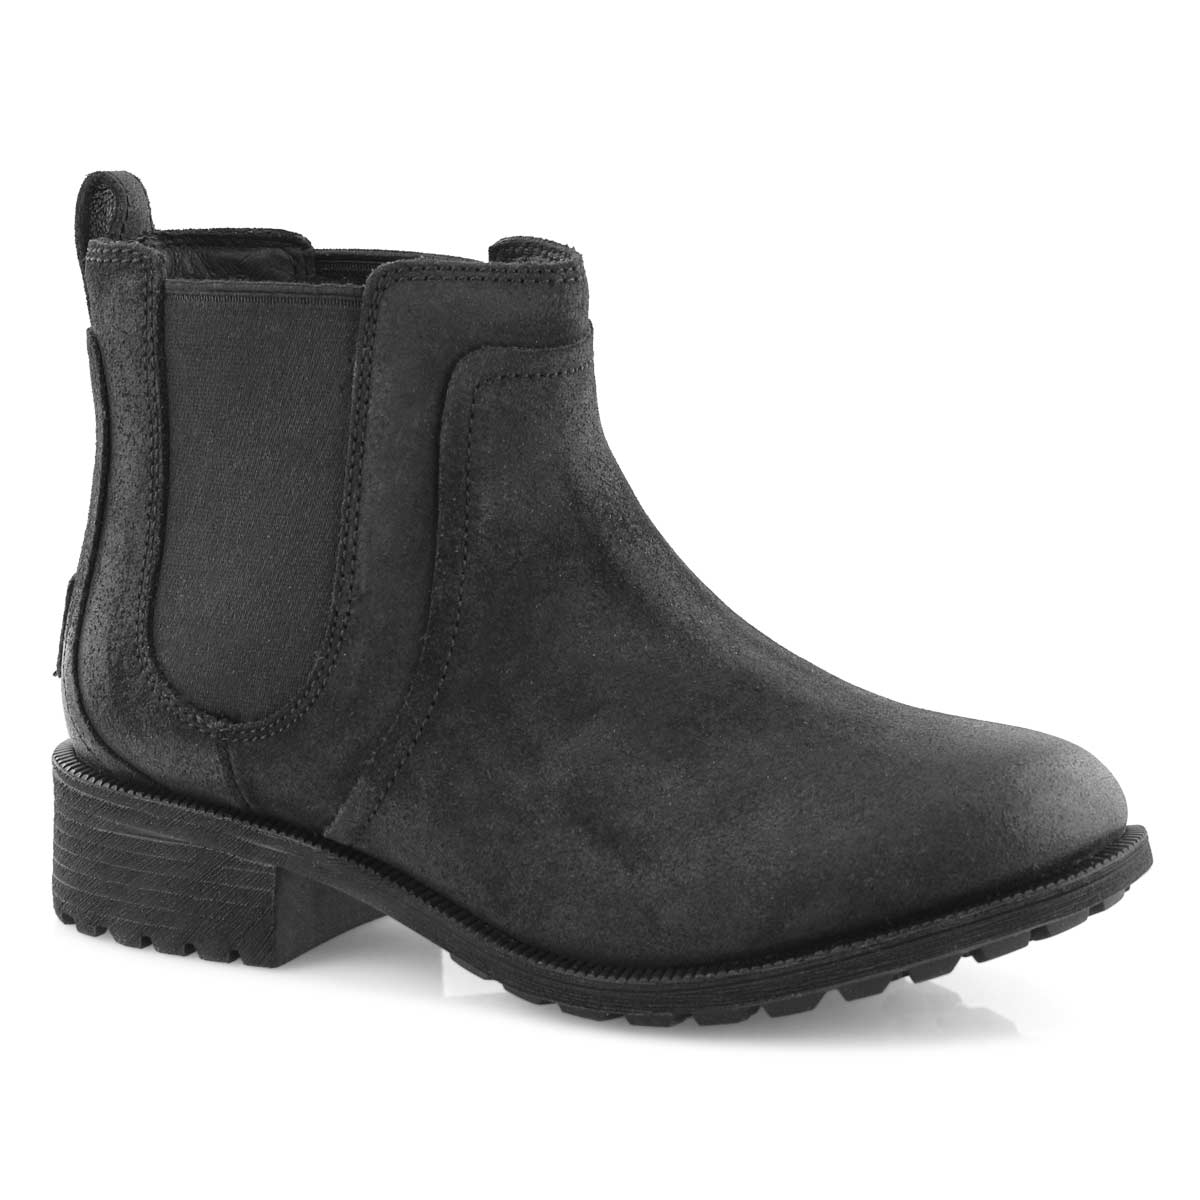 Women\u0027s BONHAM II black waterproof chelsea boots